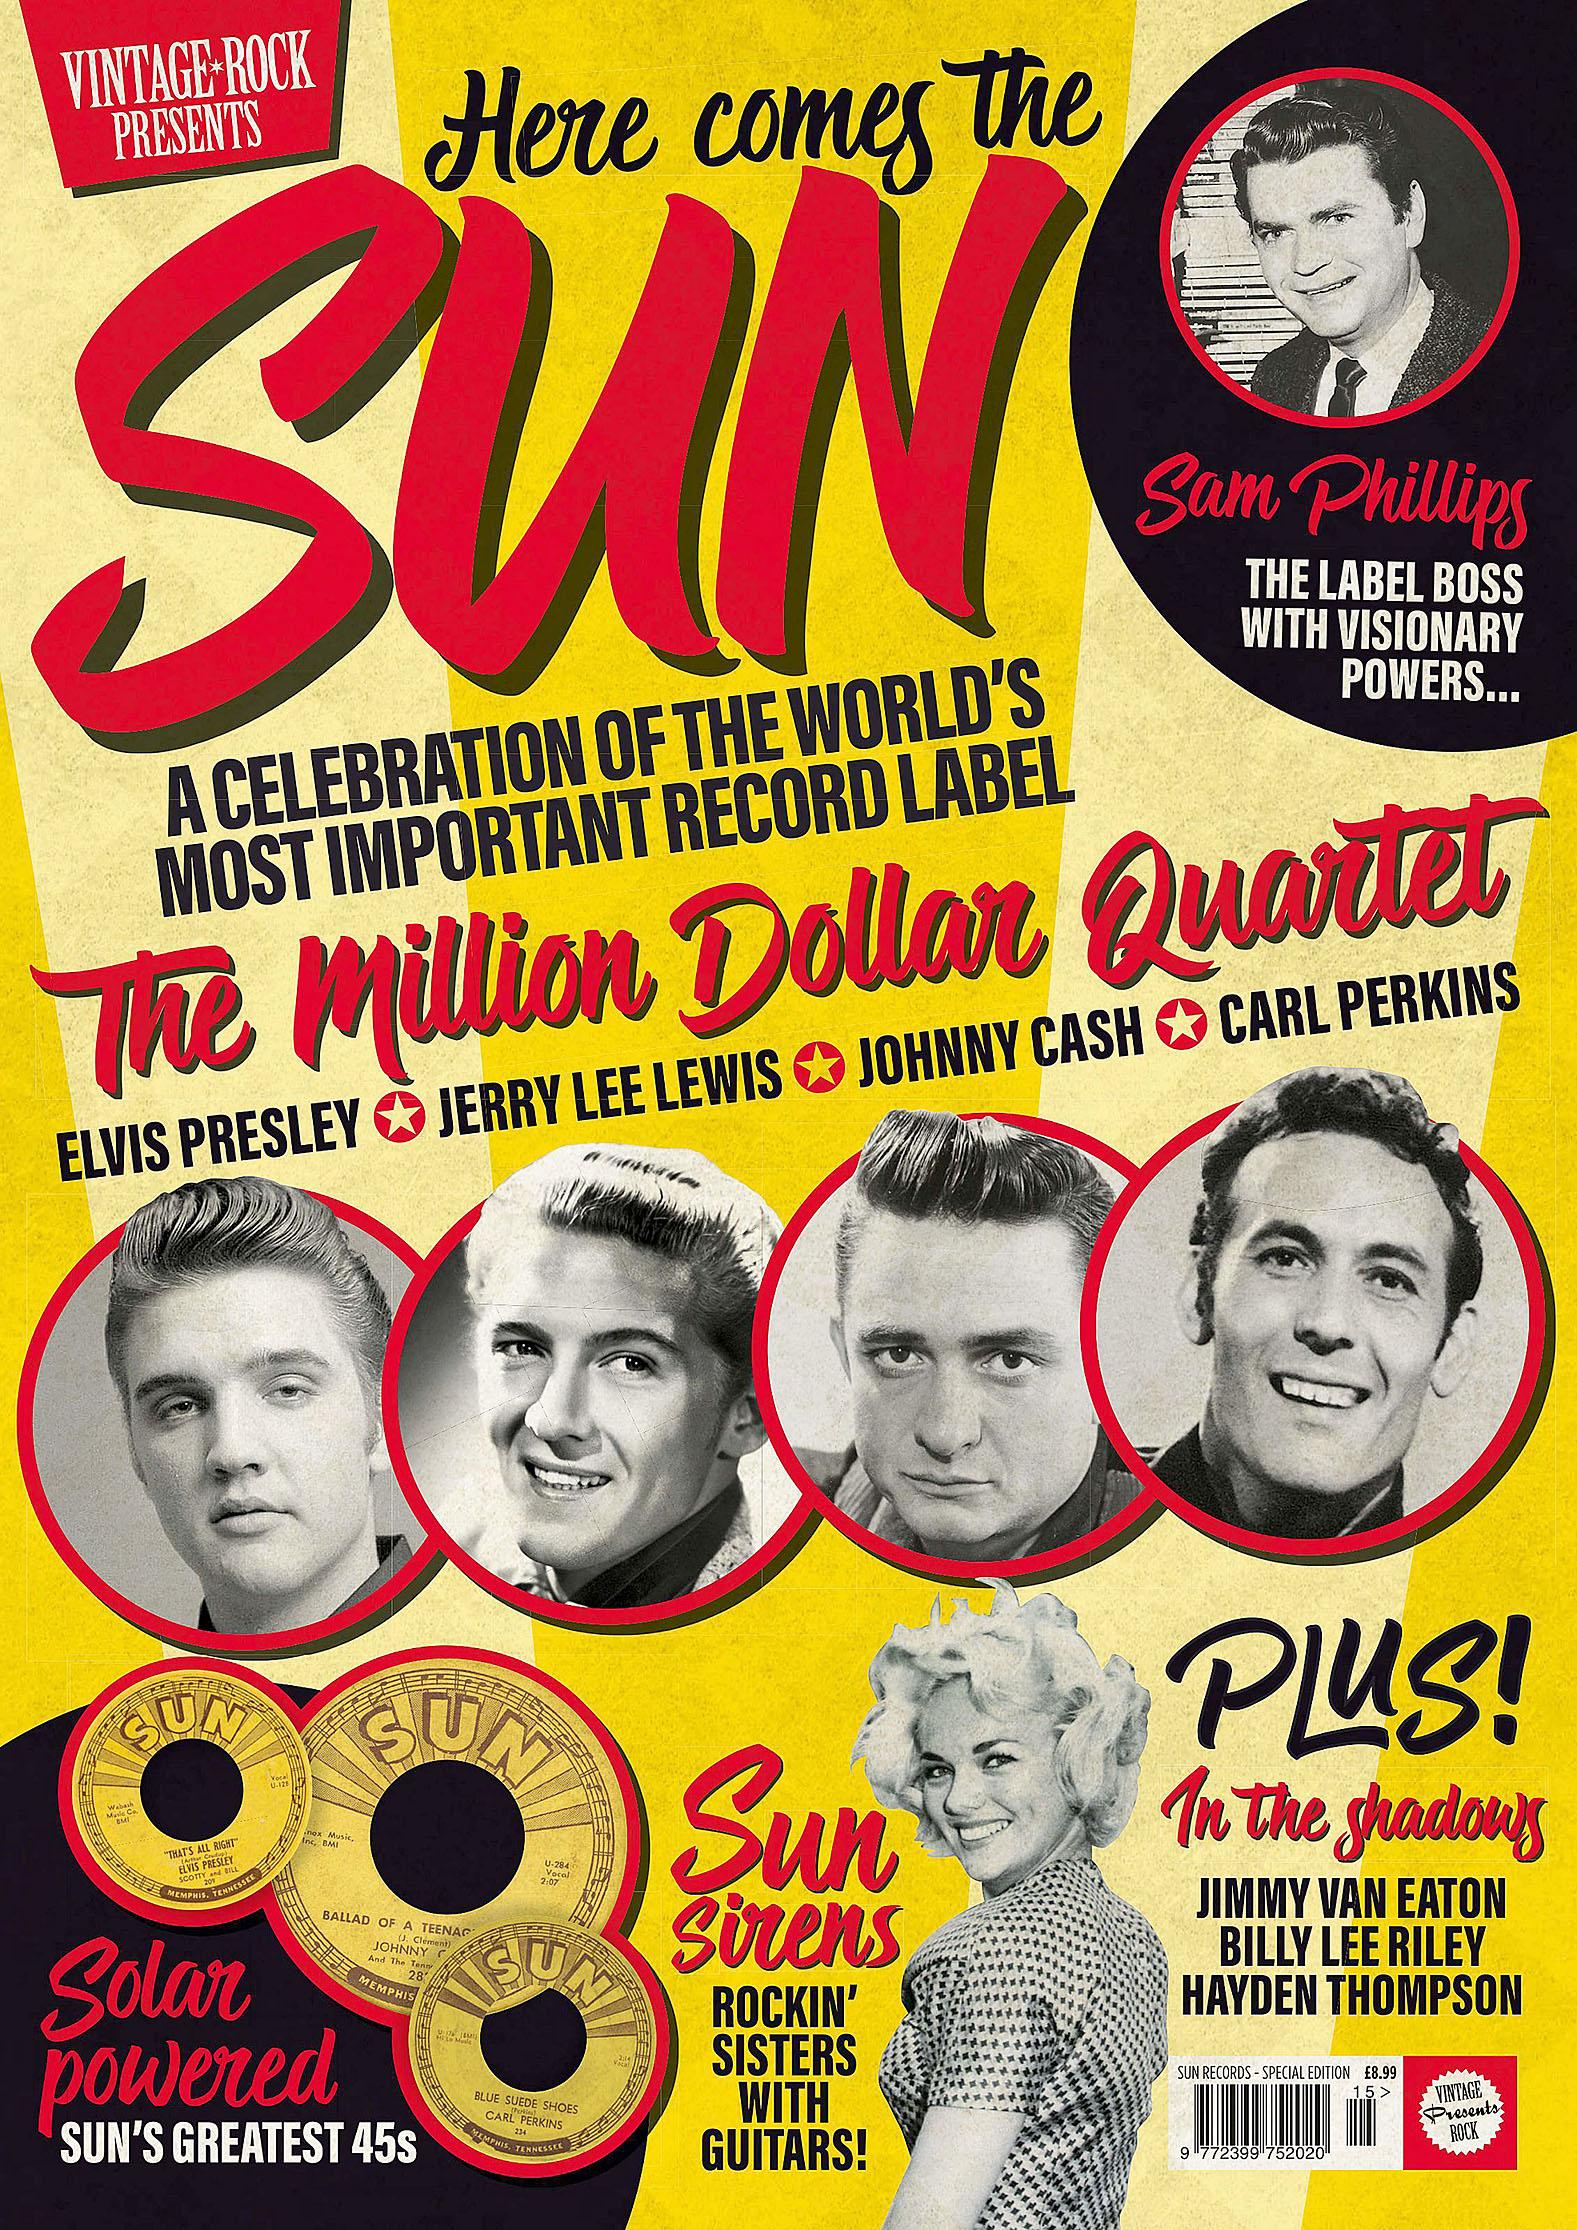 Vintage Rock Sp 2019 Sun Records.jpg